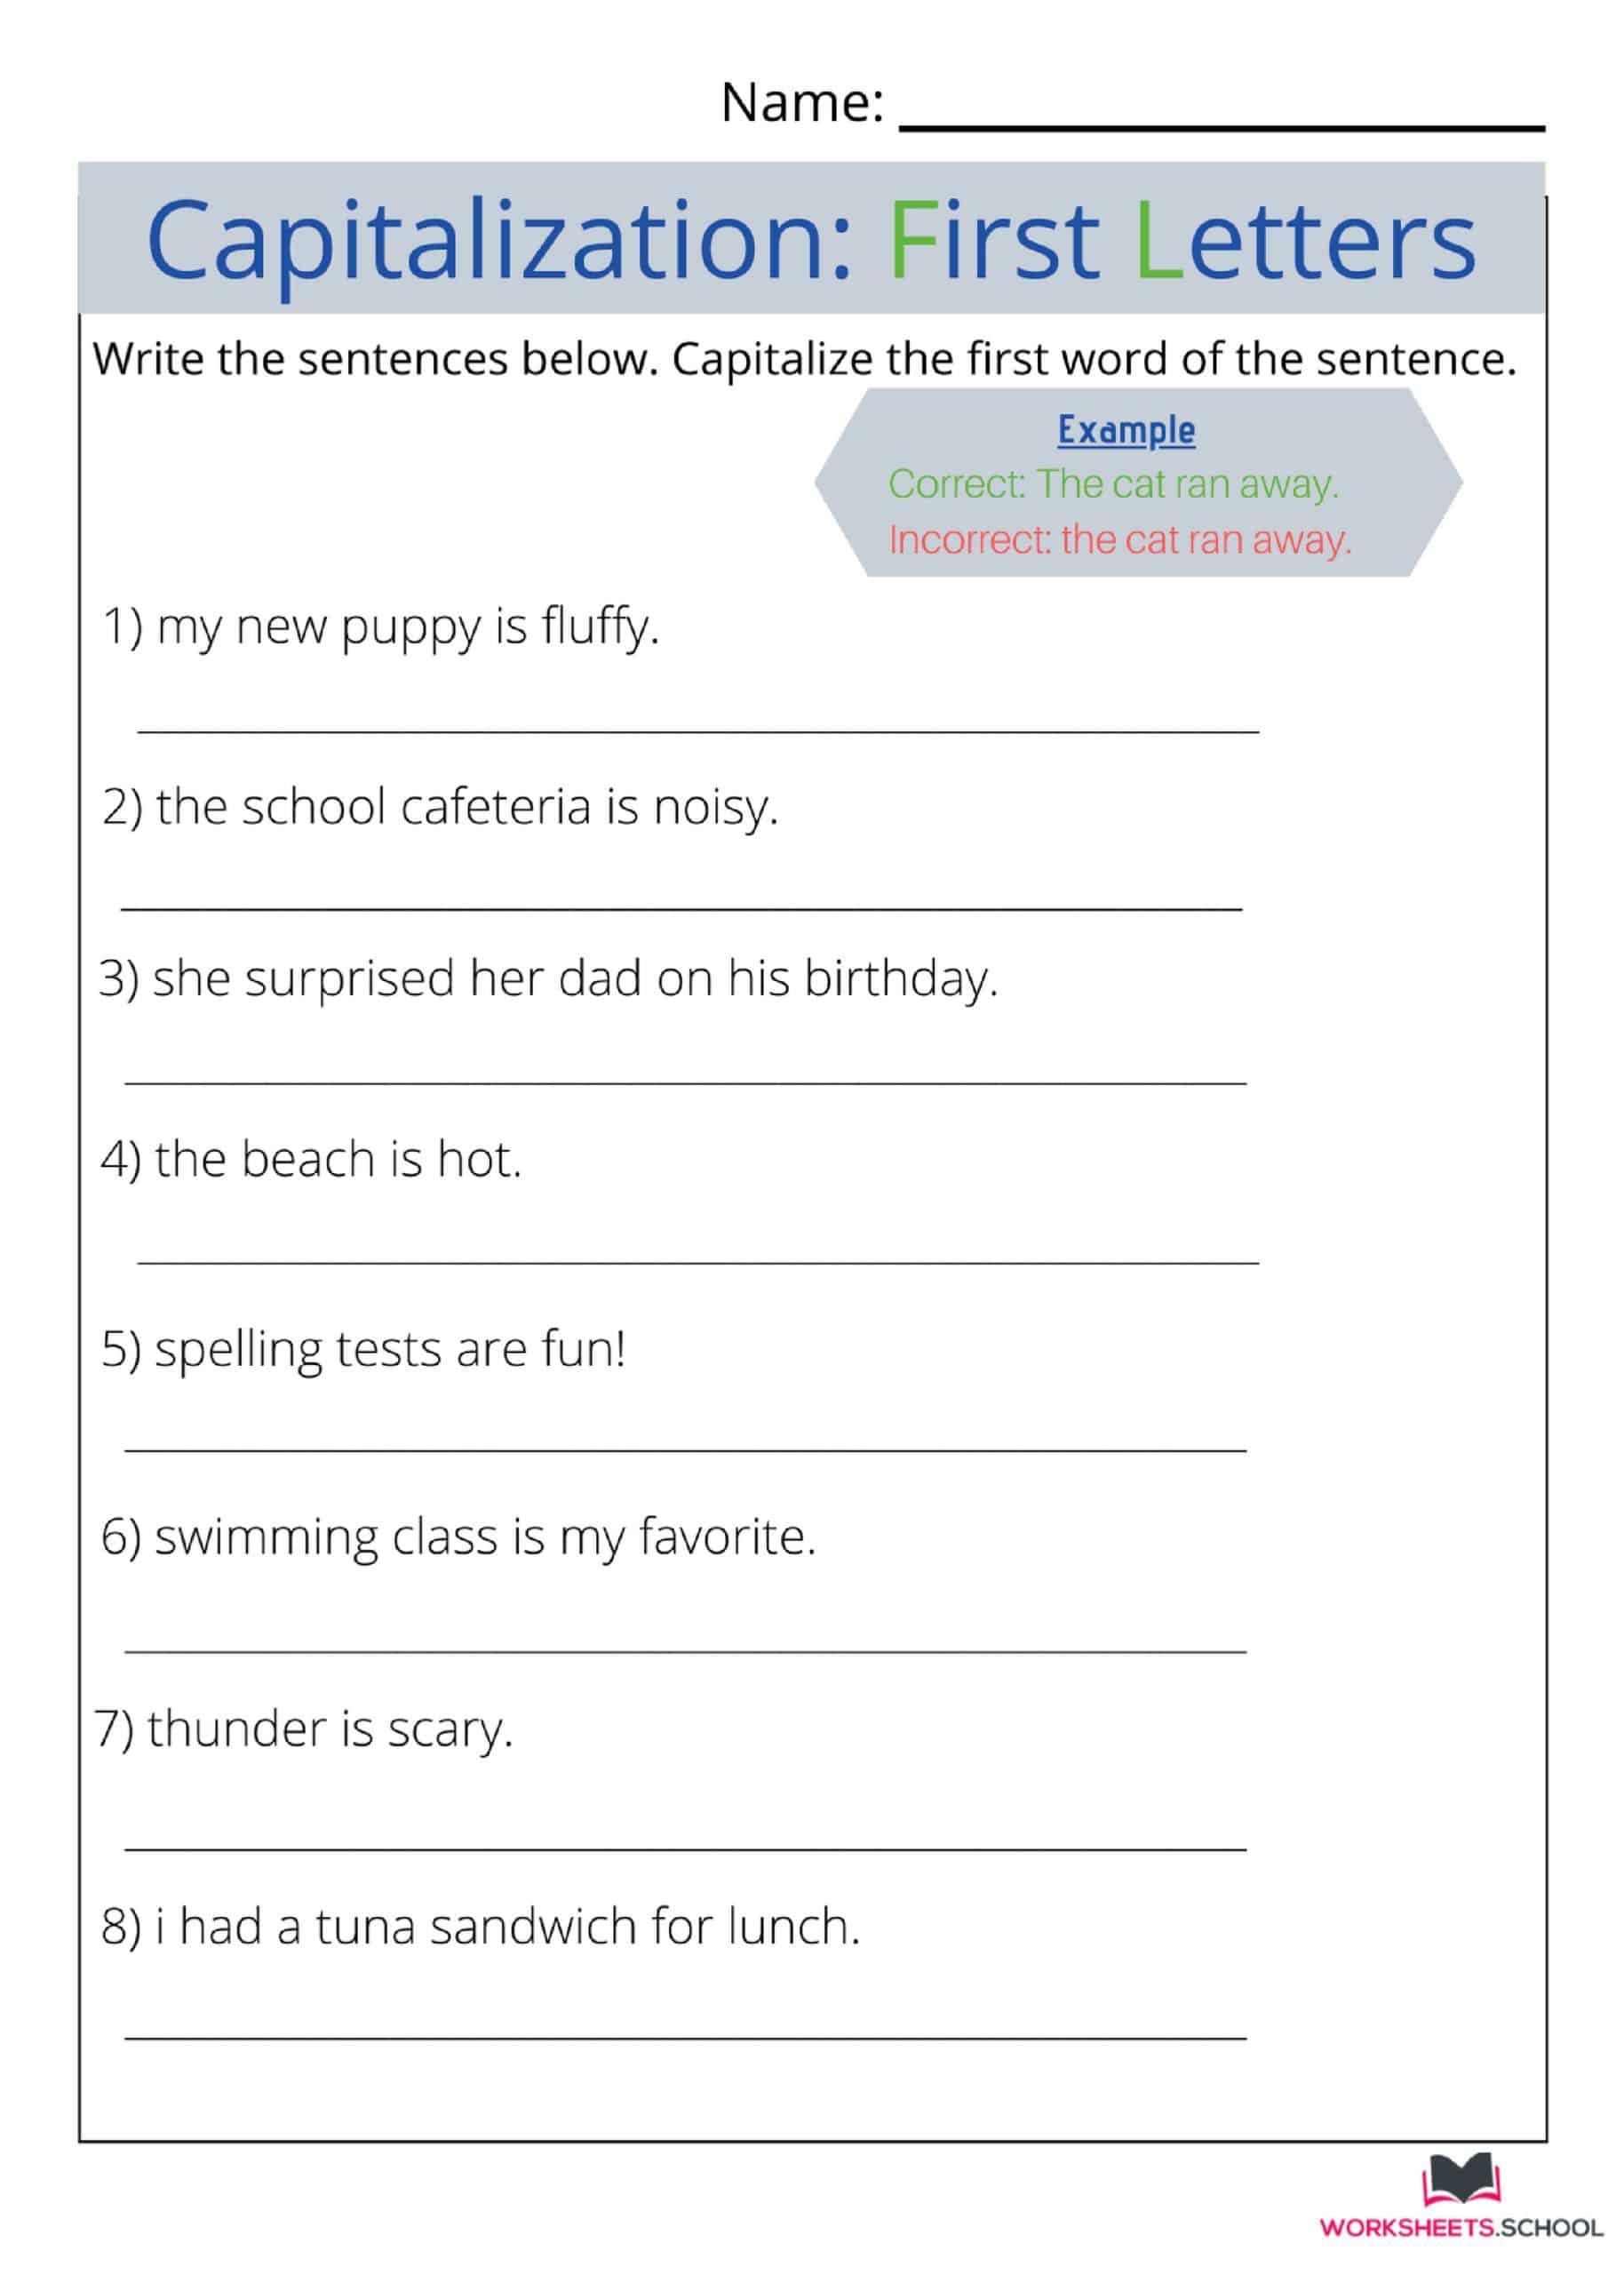 Capitalization Worksheet 10